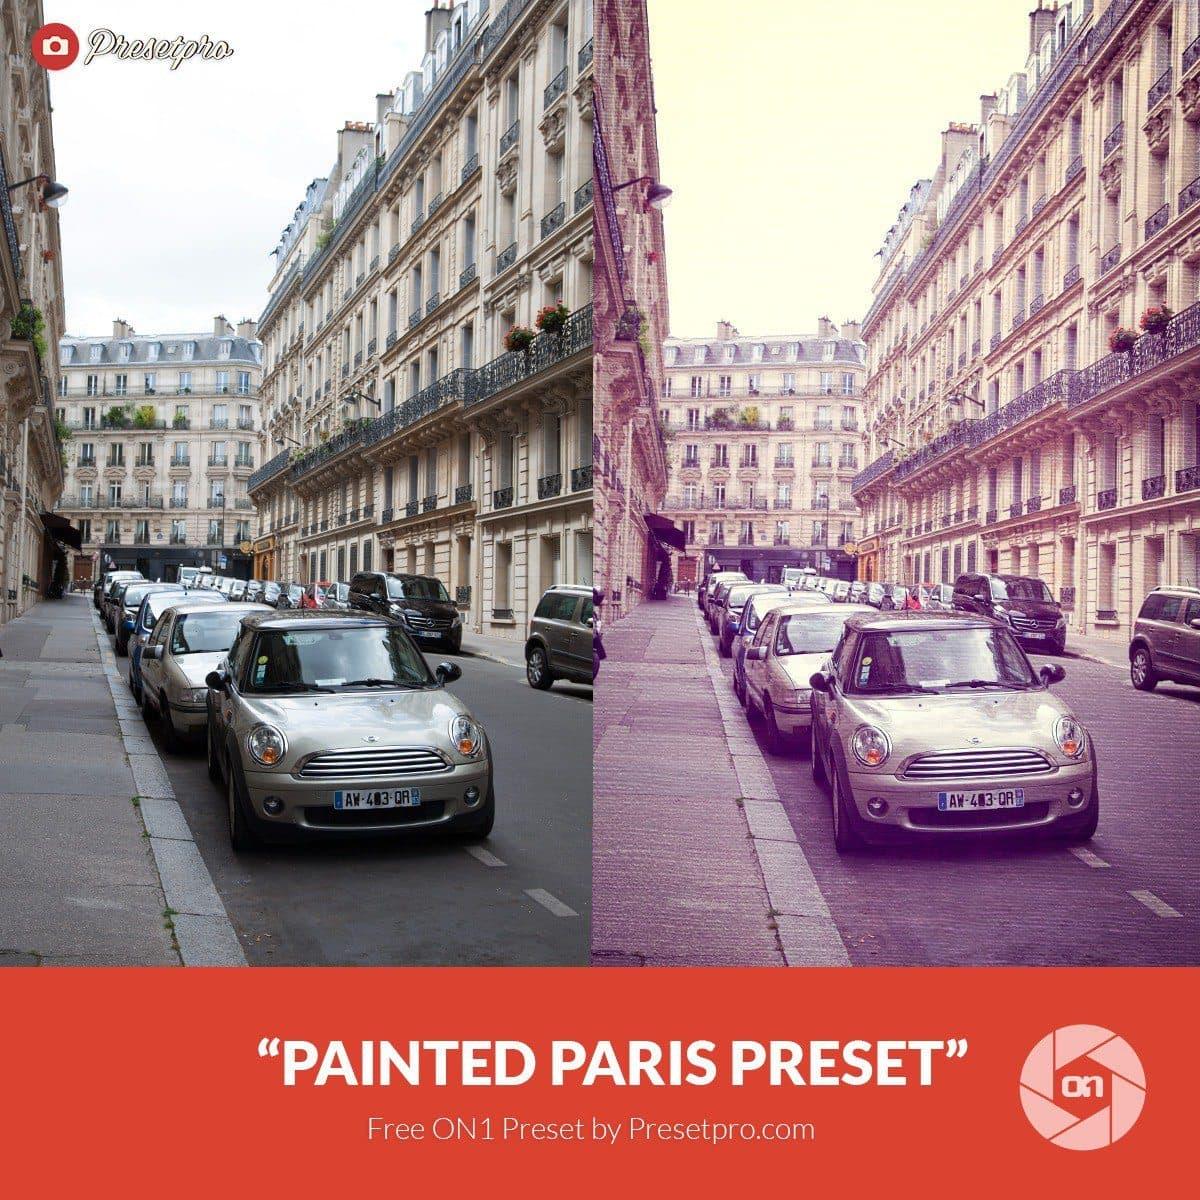 Free-On1-Preset-Painted-Paris-Presetpro.com